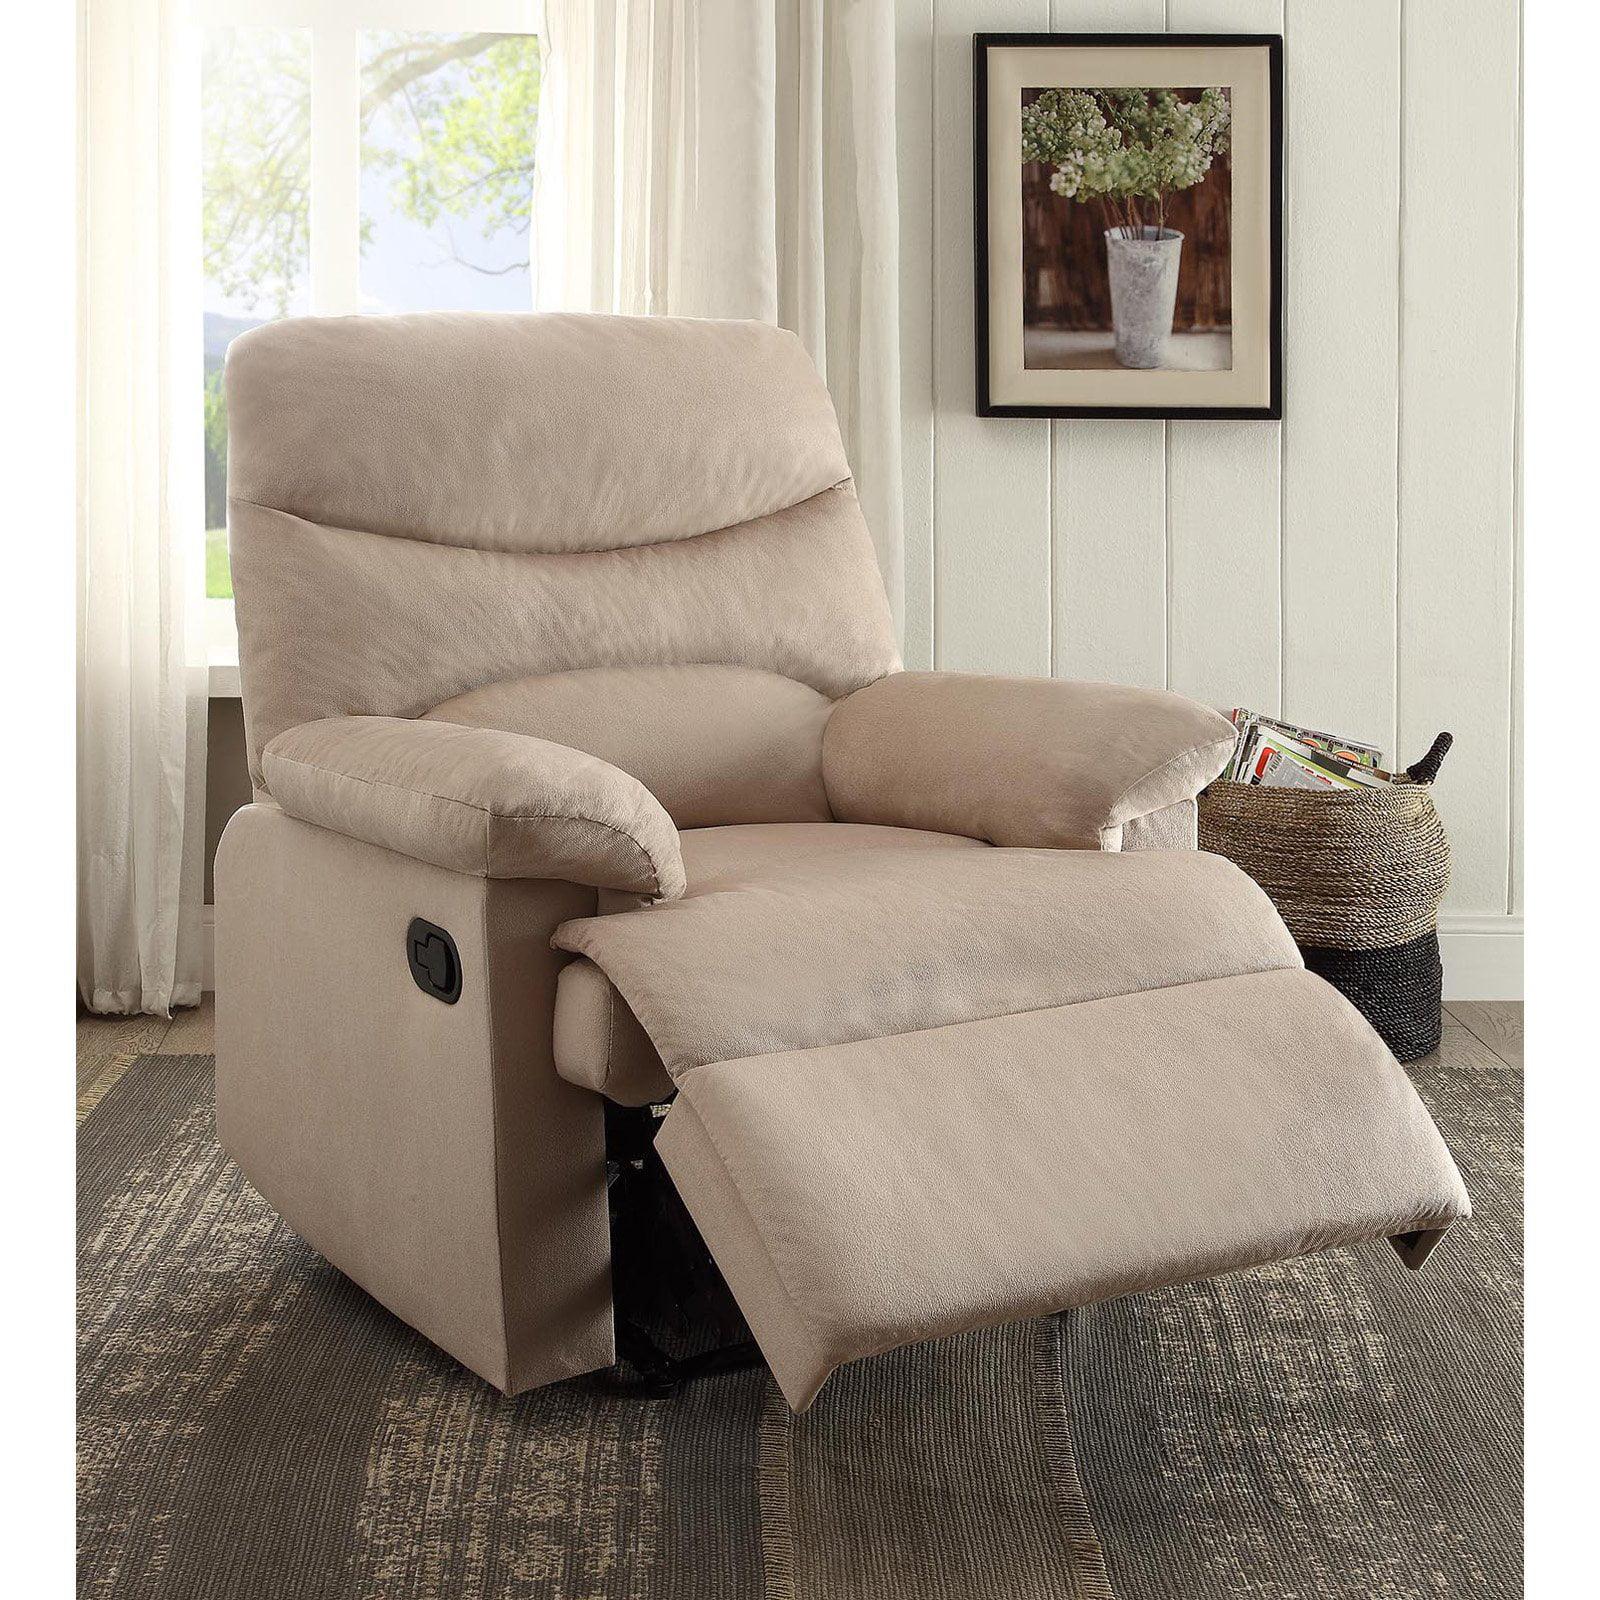 Oakwood Woven Fabric Recliner, Beige - Walmart.com